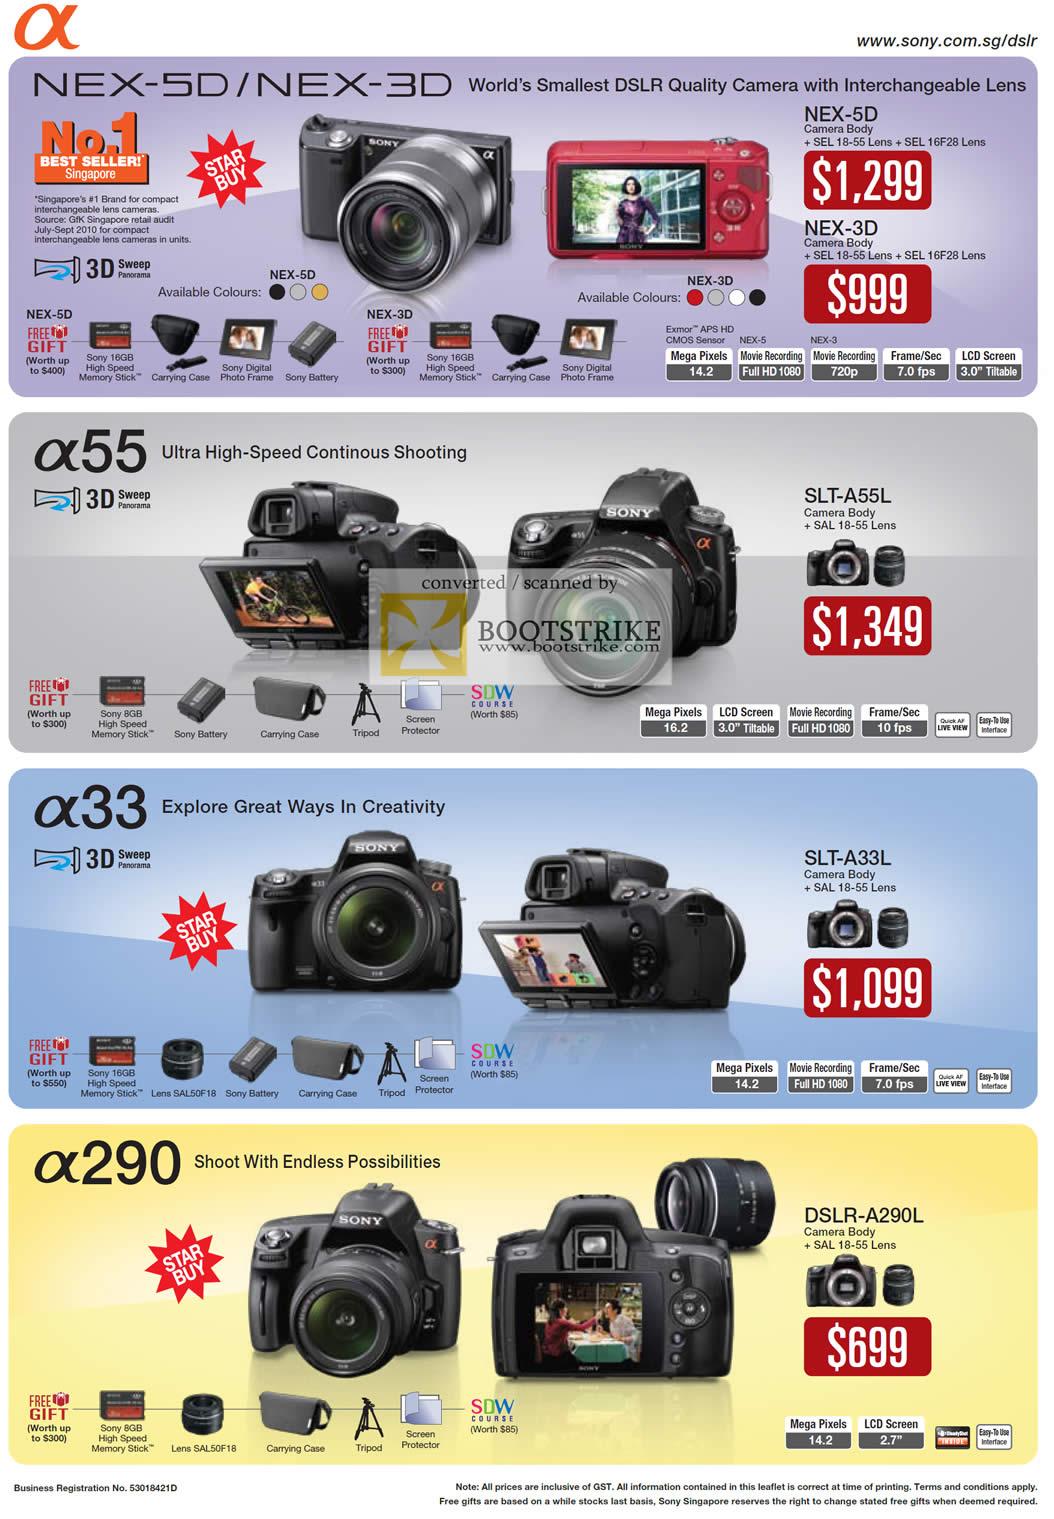 Camera Prices Of Dslr Cameras sony dslr camera prices